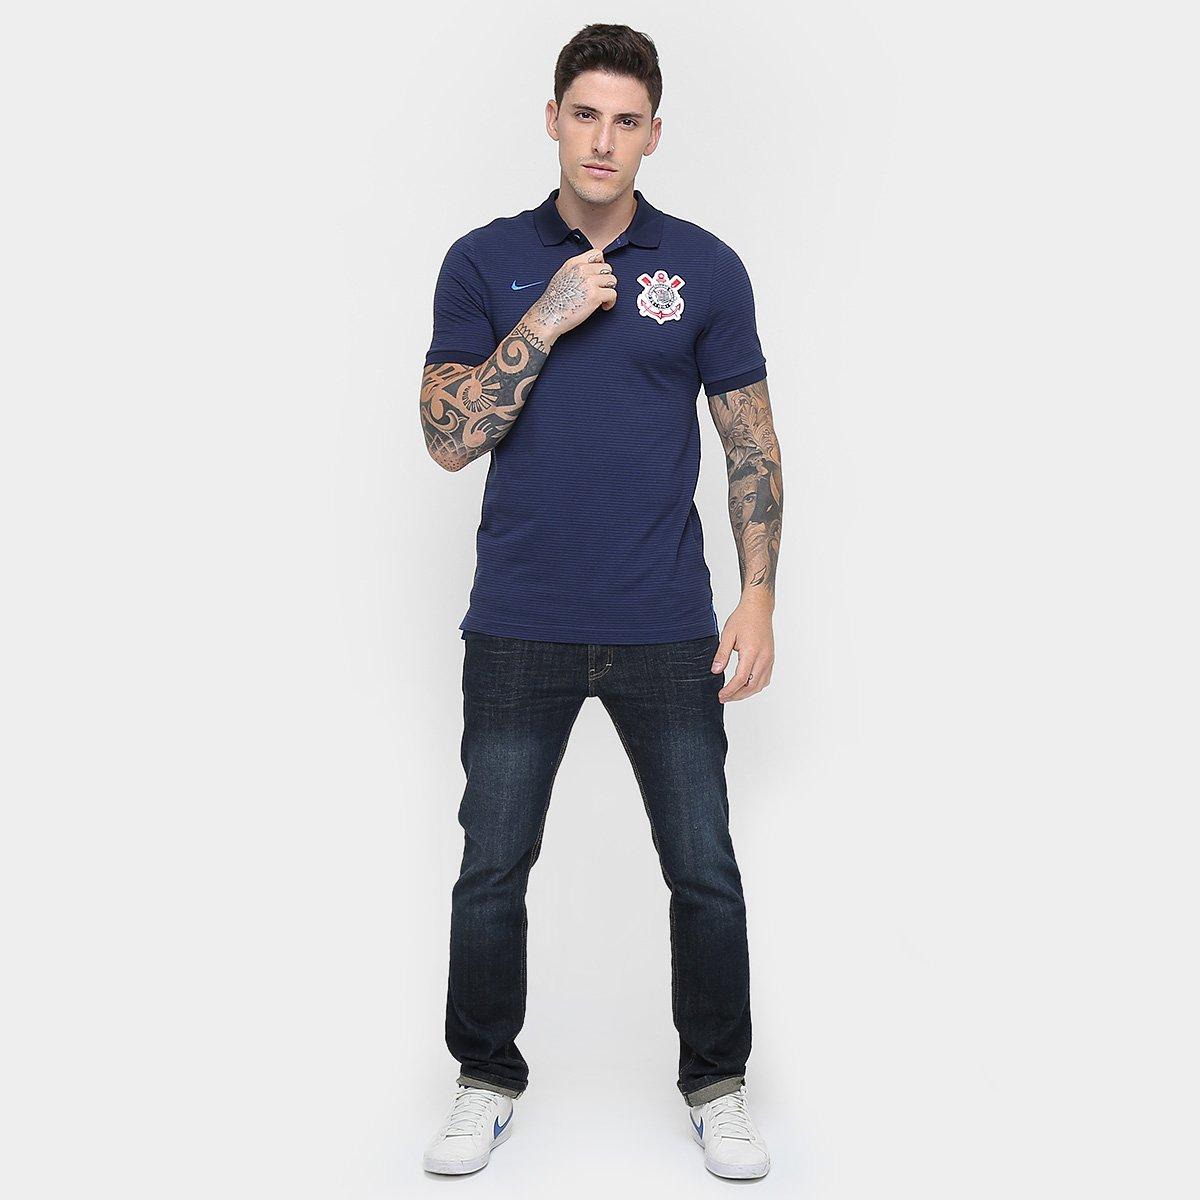 Camisa Polo Corinthians Nike Masculina - Compre Agora  9a092f72b9662